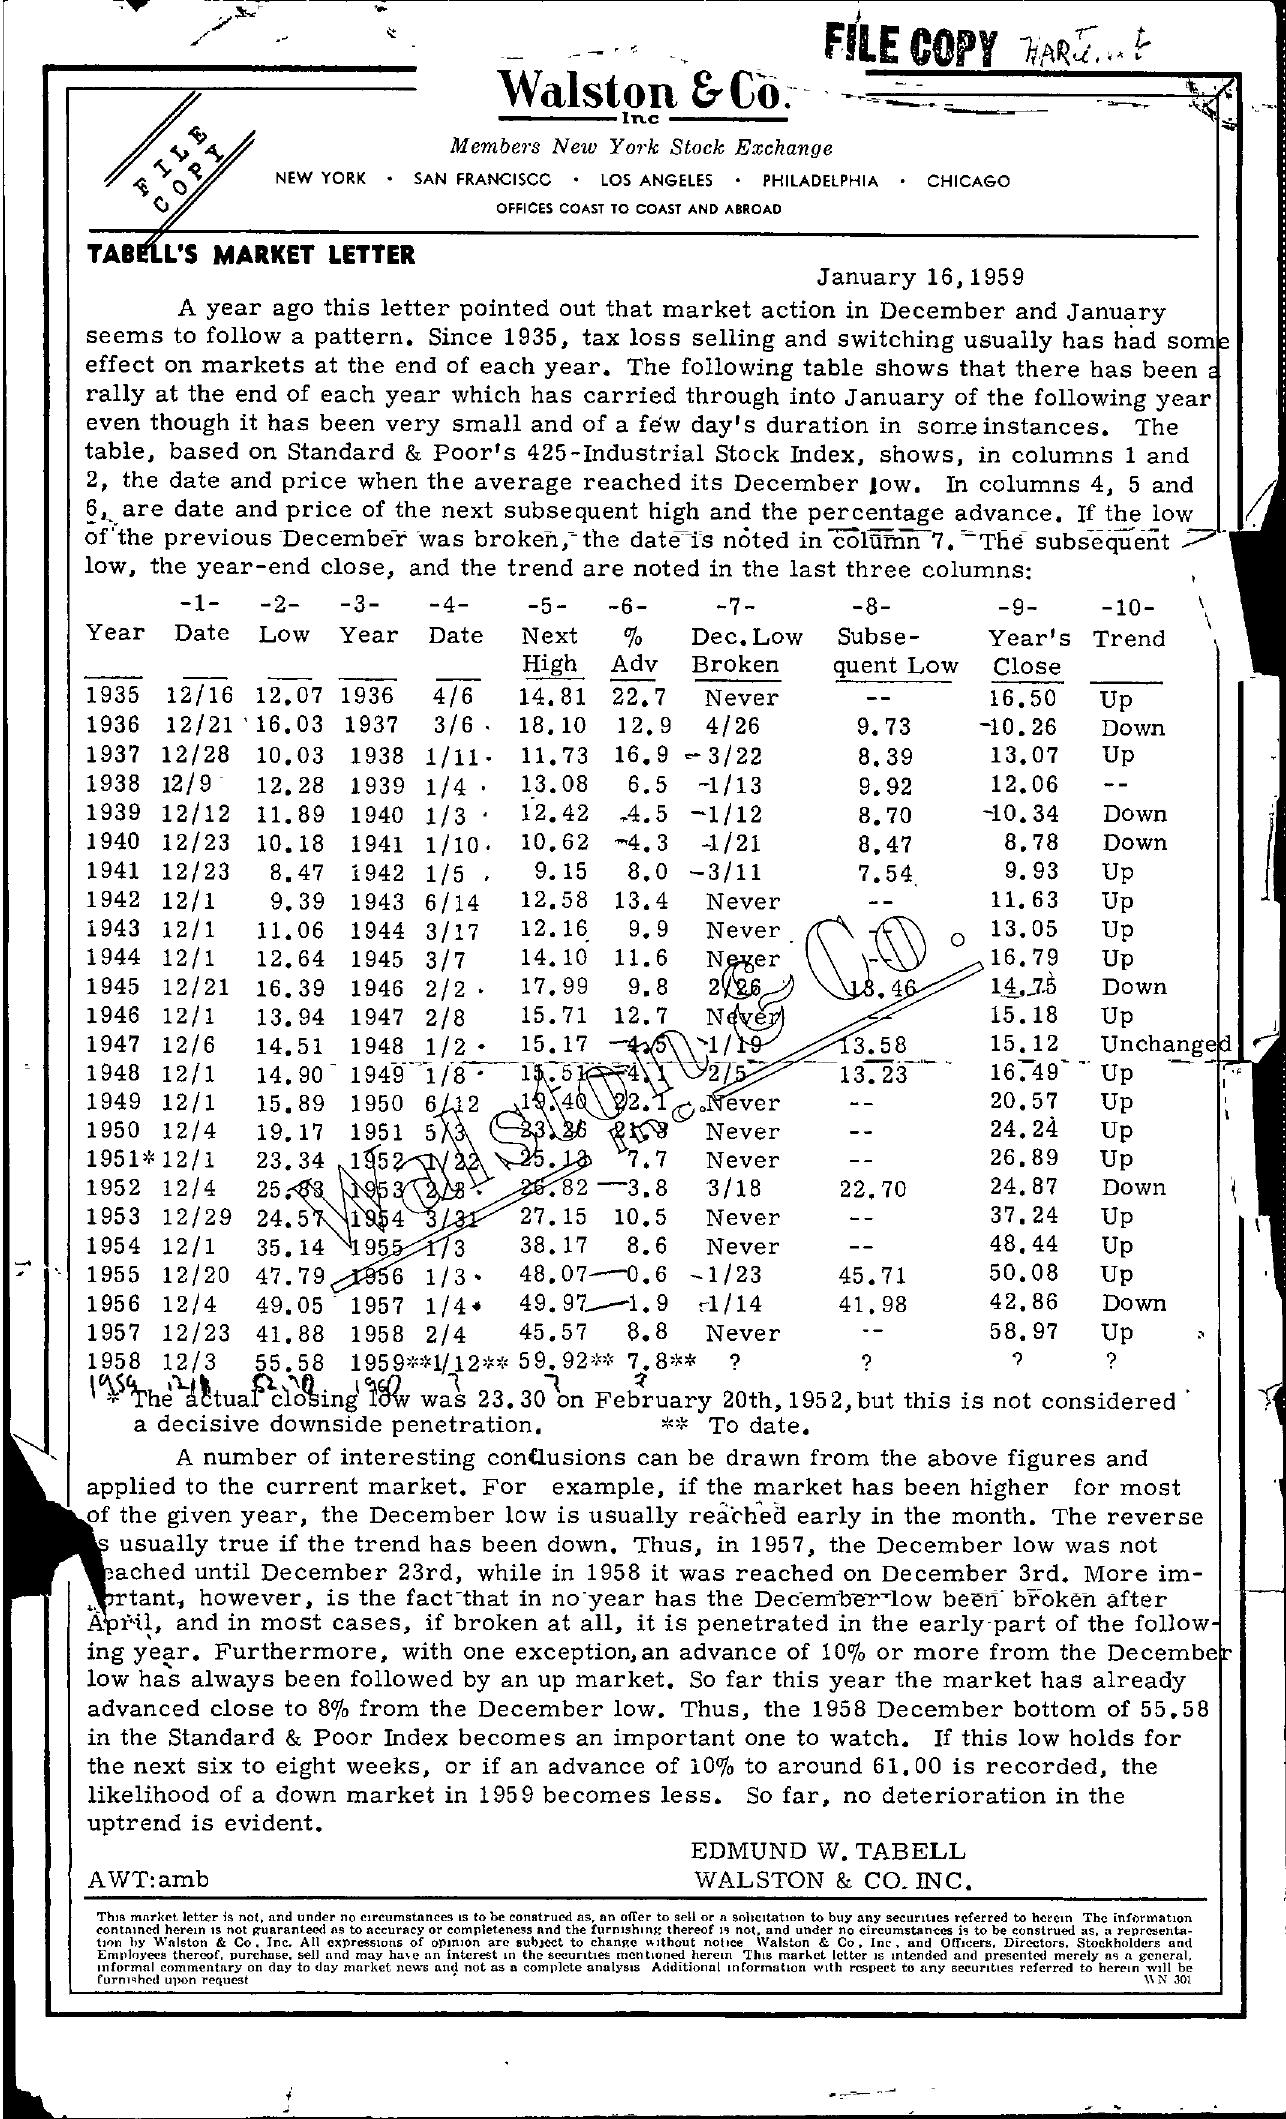 Tabell's Market Letter - January 16, 1959